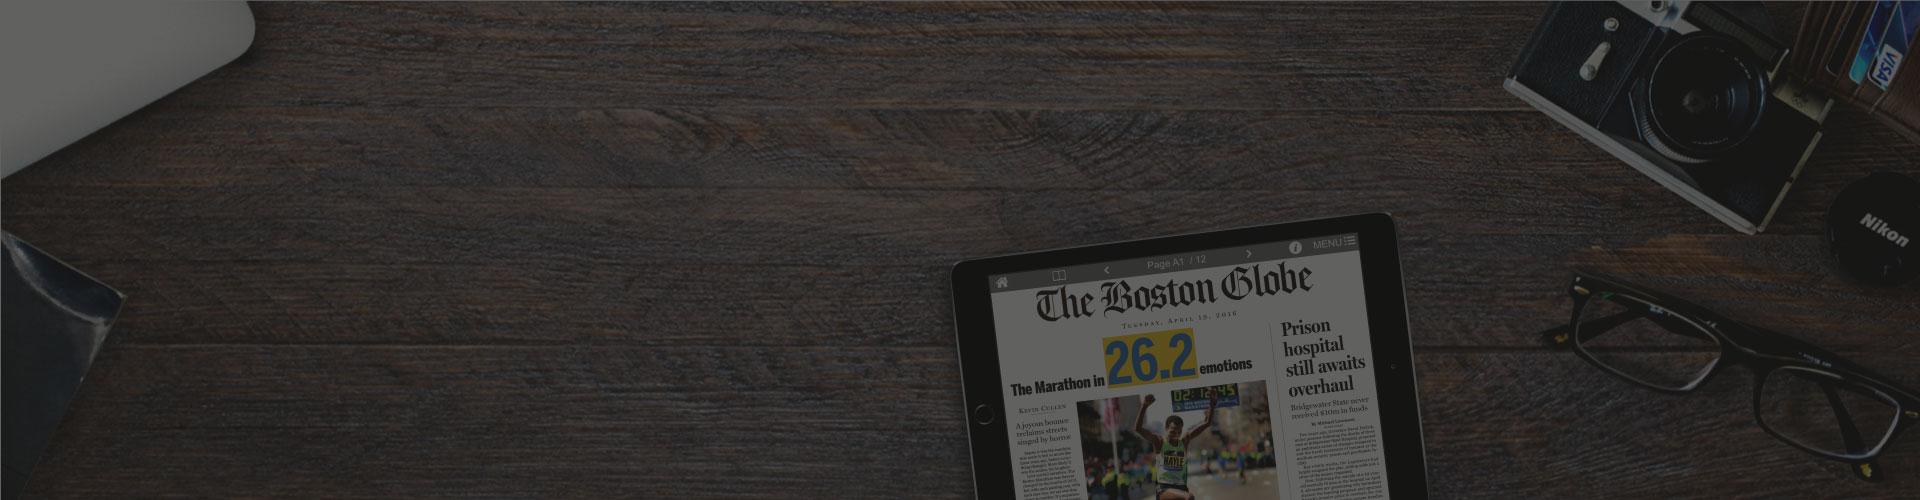 Header image of The Boston Globe